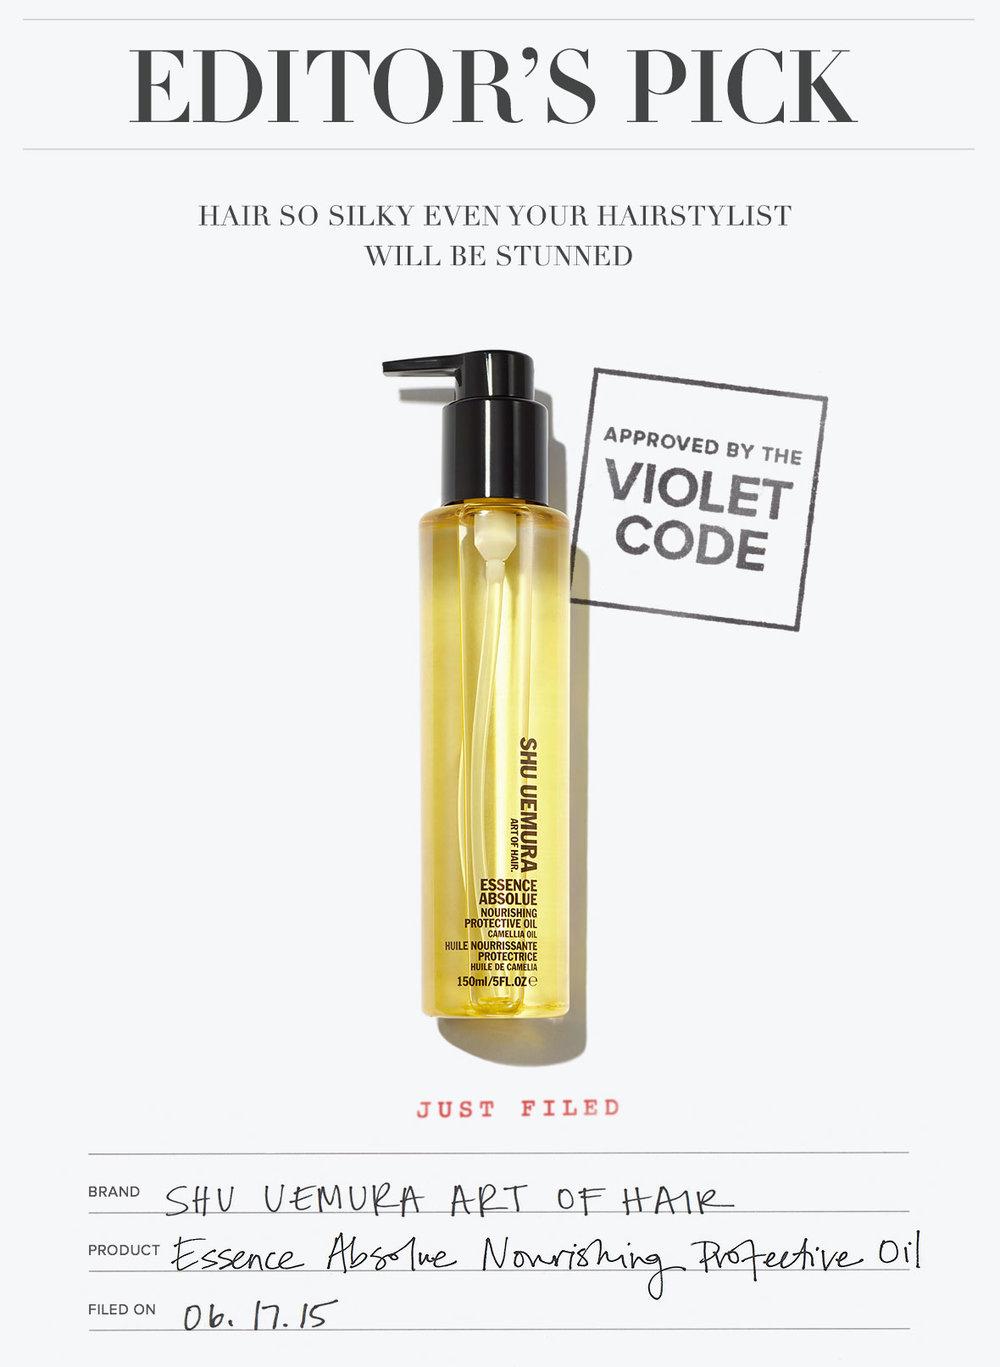 shu-uemura-art-of-hair-essence-absolue-nourishing-protective-oil-Email.jpg